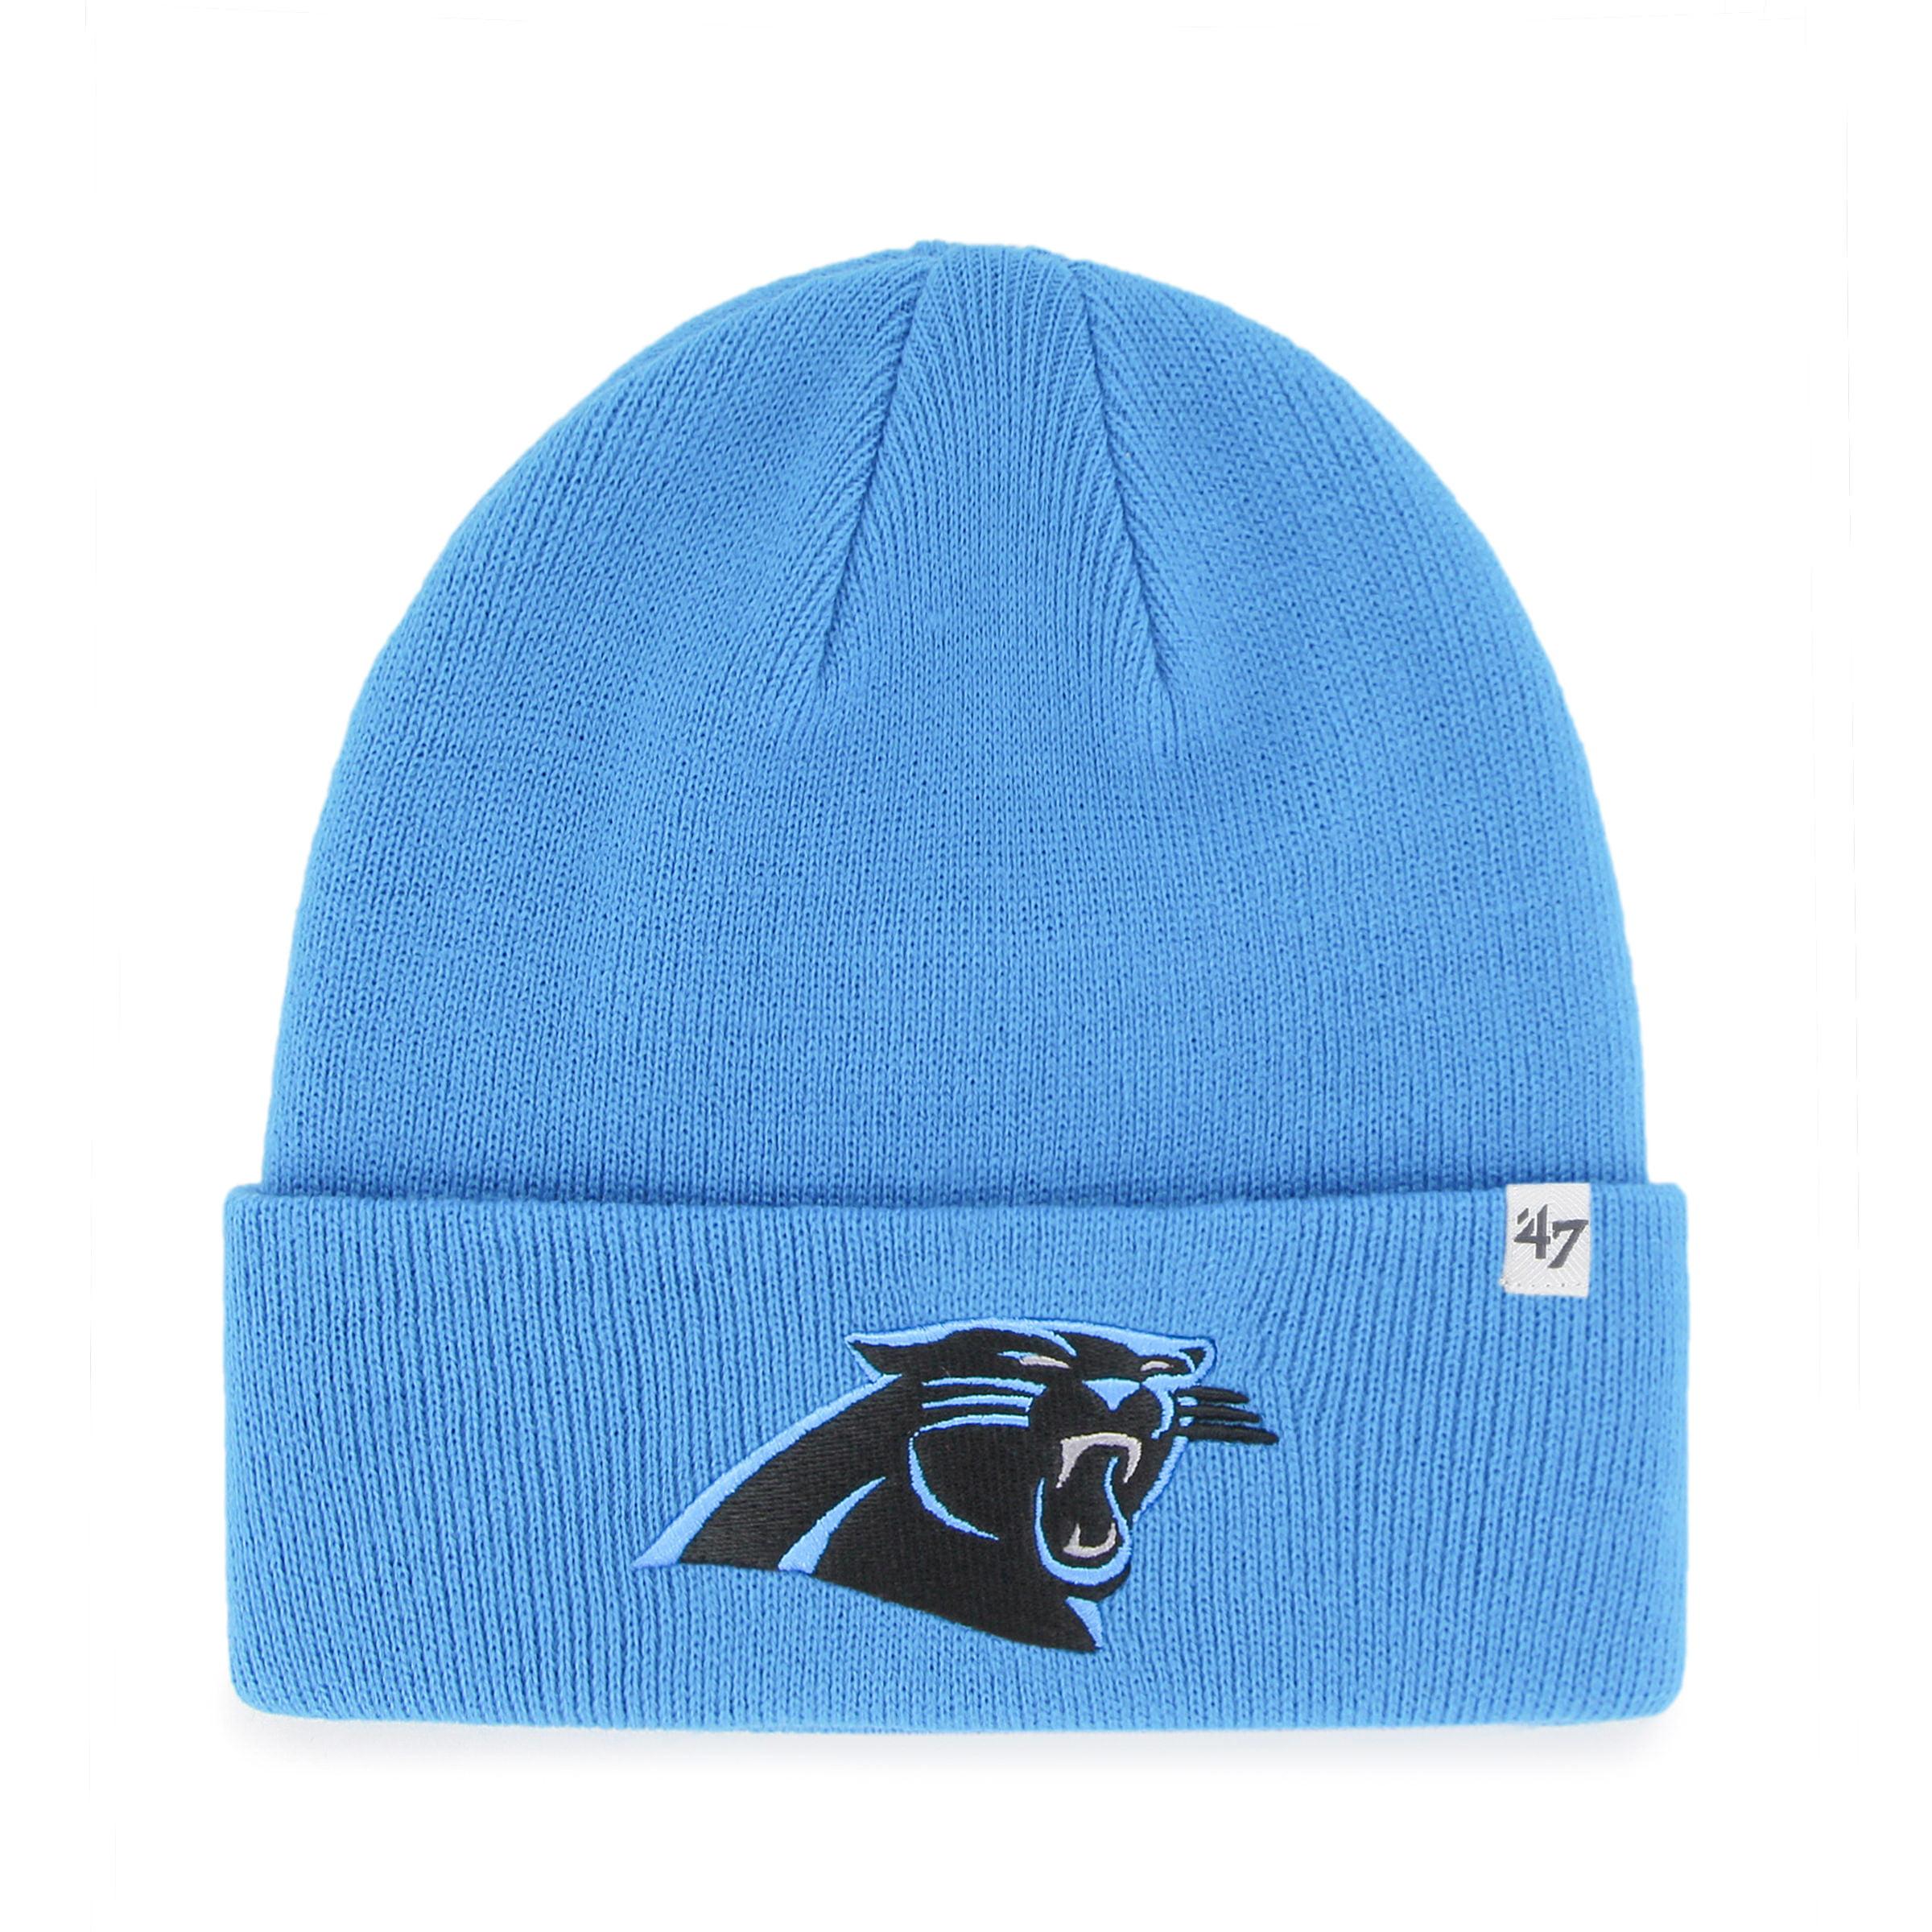 Carolina Panthers NFL Raised Cuffed Knit Beanie 936978d5ace